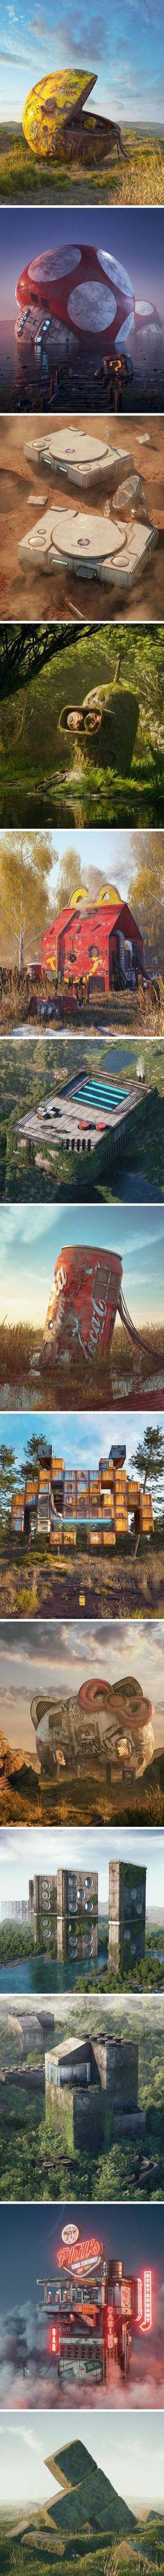 Pop Culture Apocalypse In Amazing Digital Art